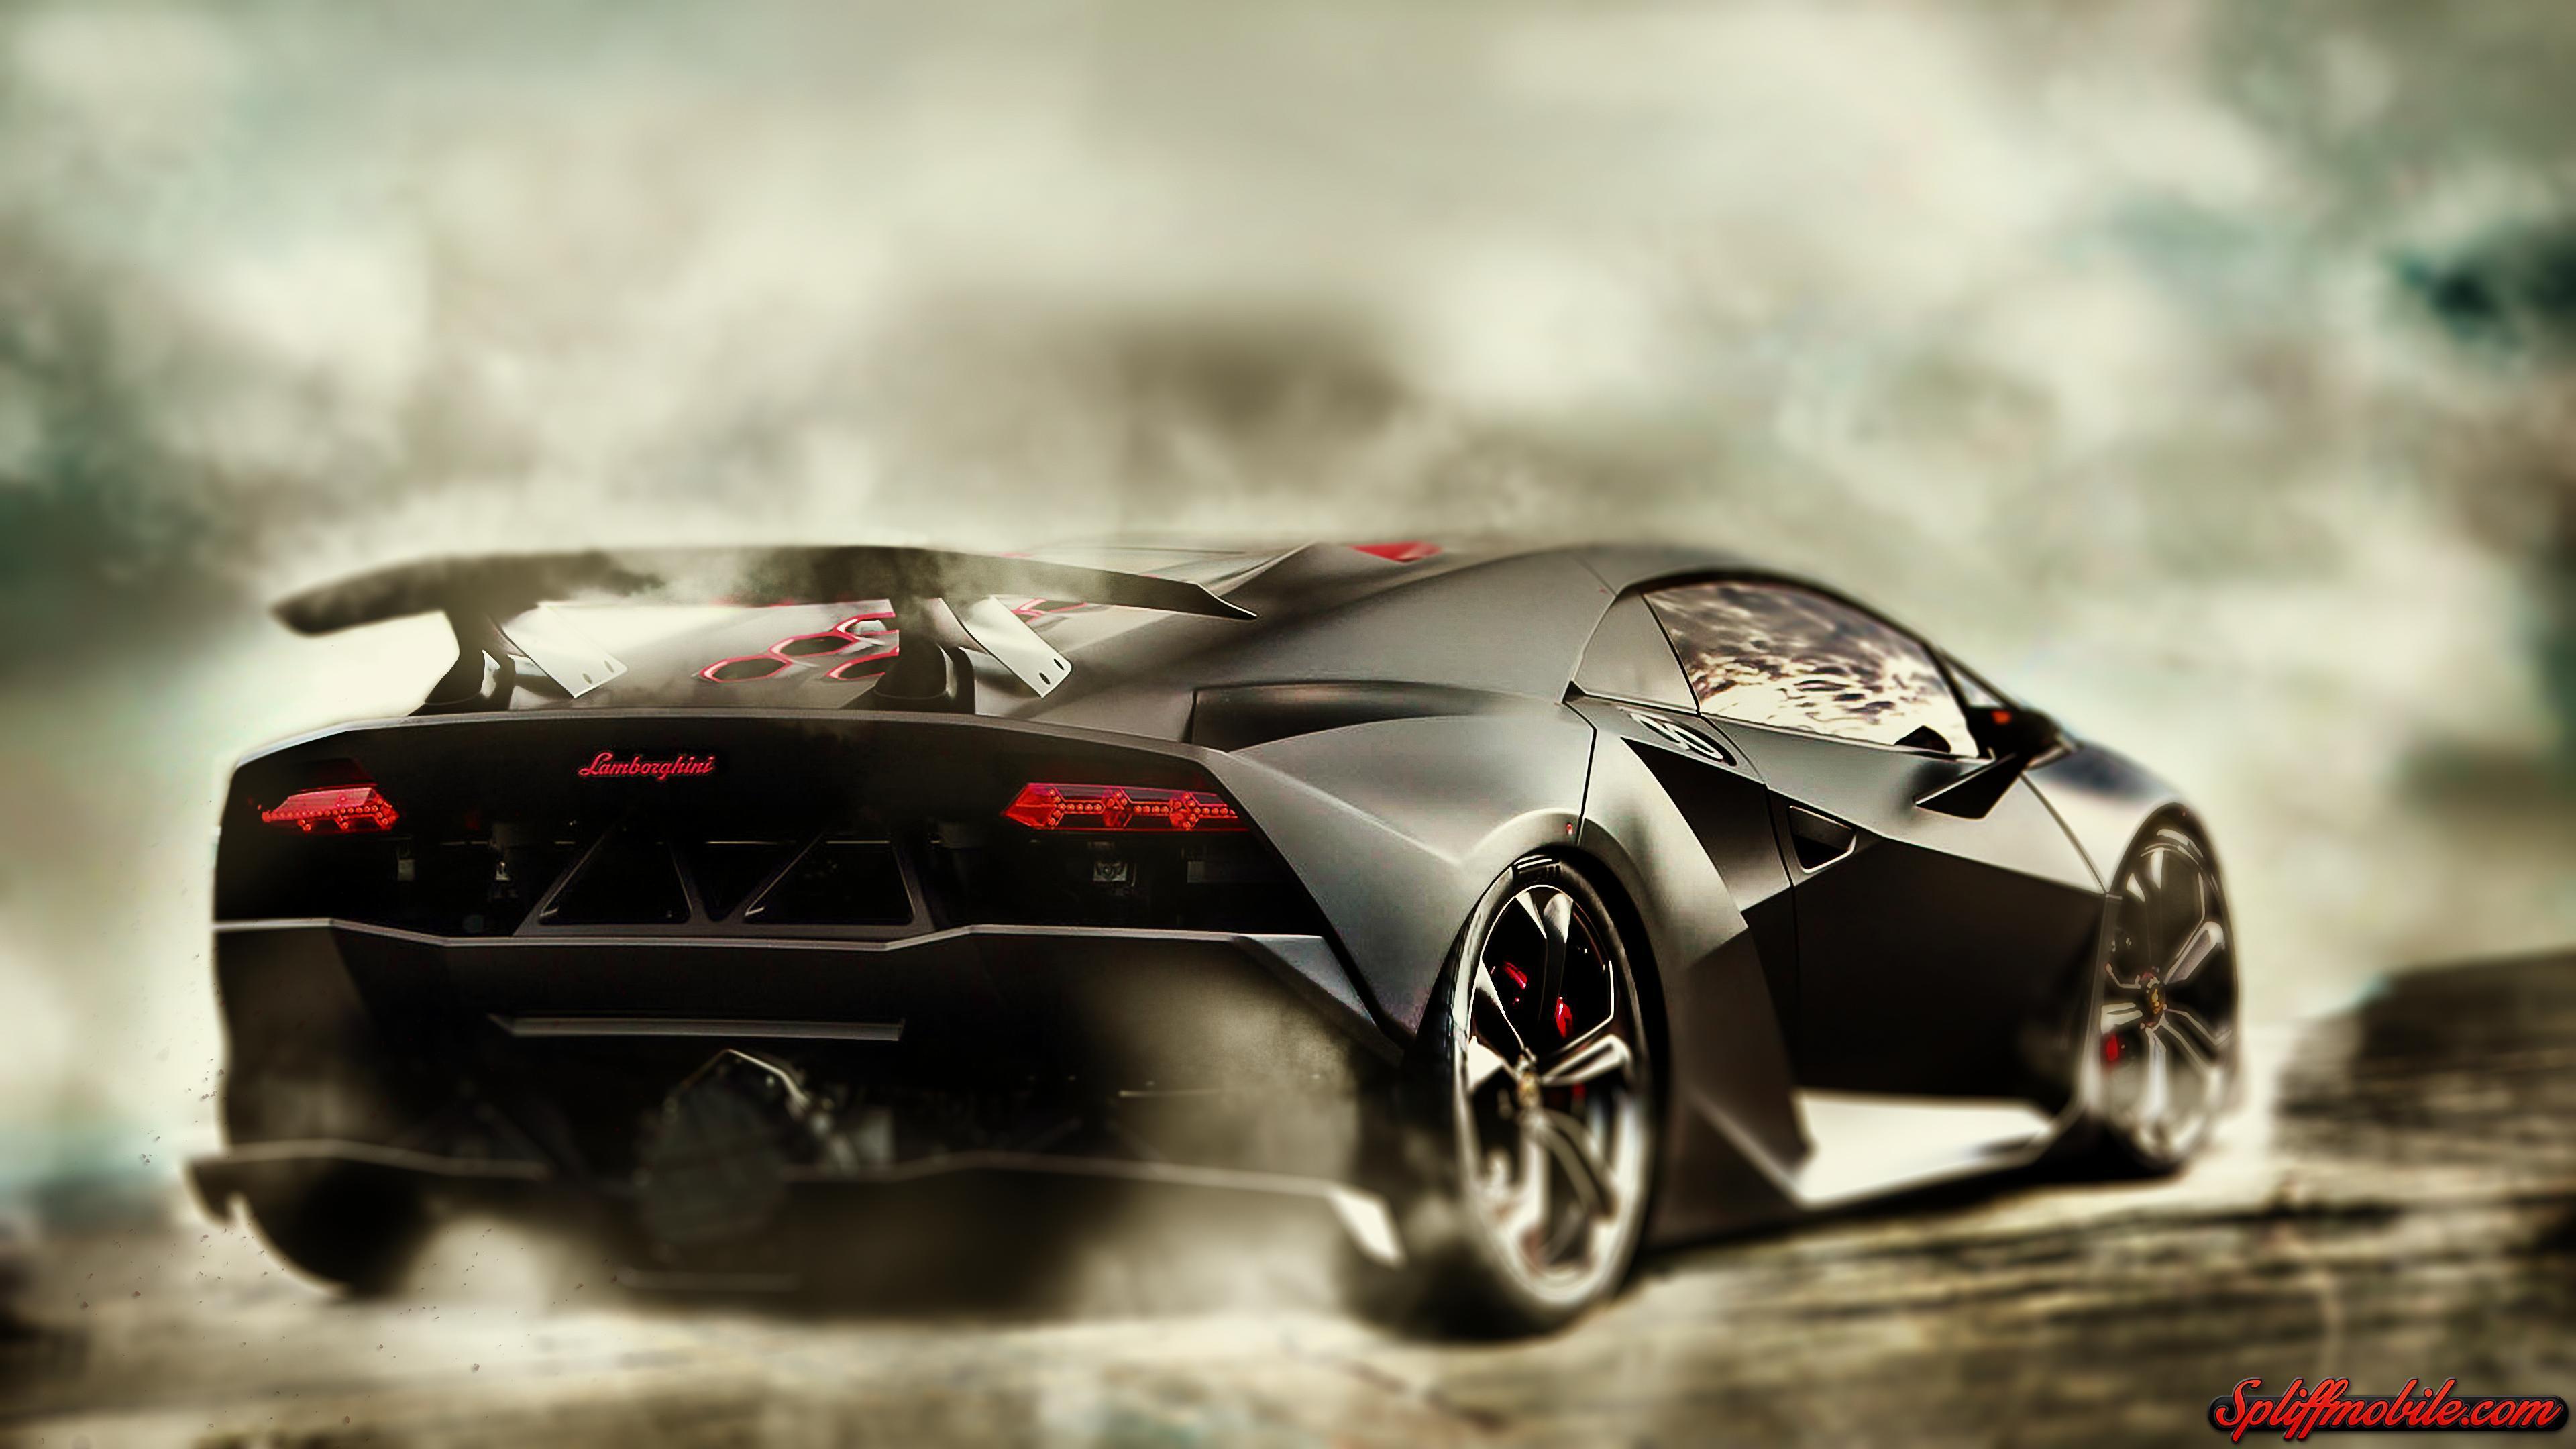 Pack De 55 Wallpapers De Carros Hd: Wallpapers Full HD 1080p Lamborghini New 2016